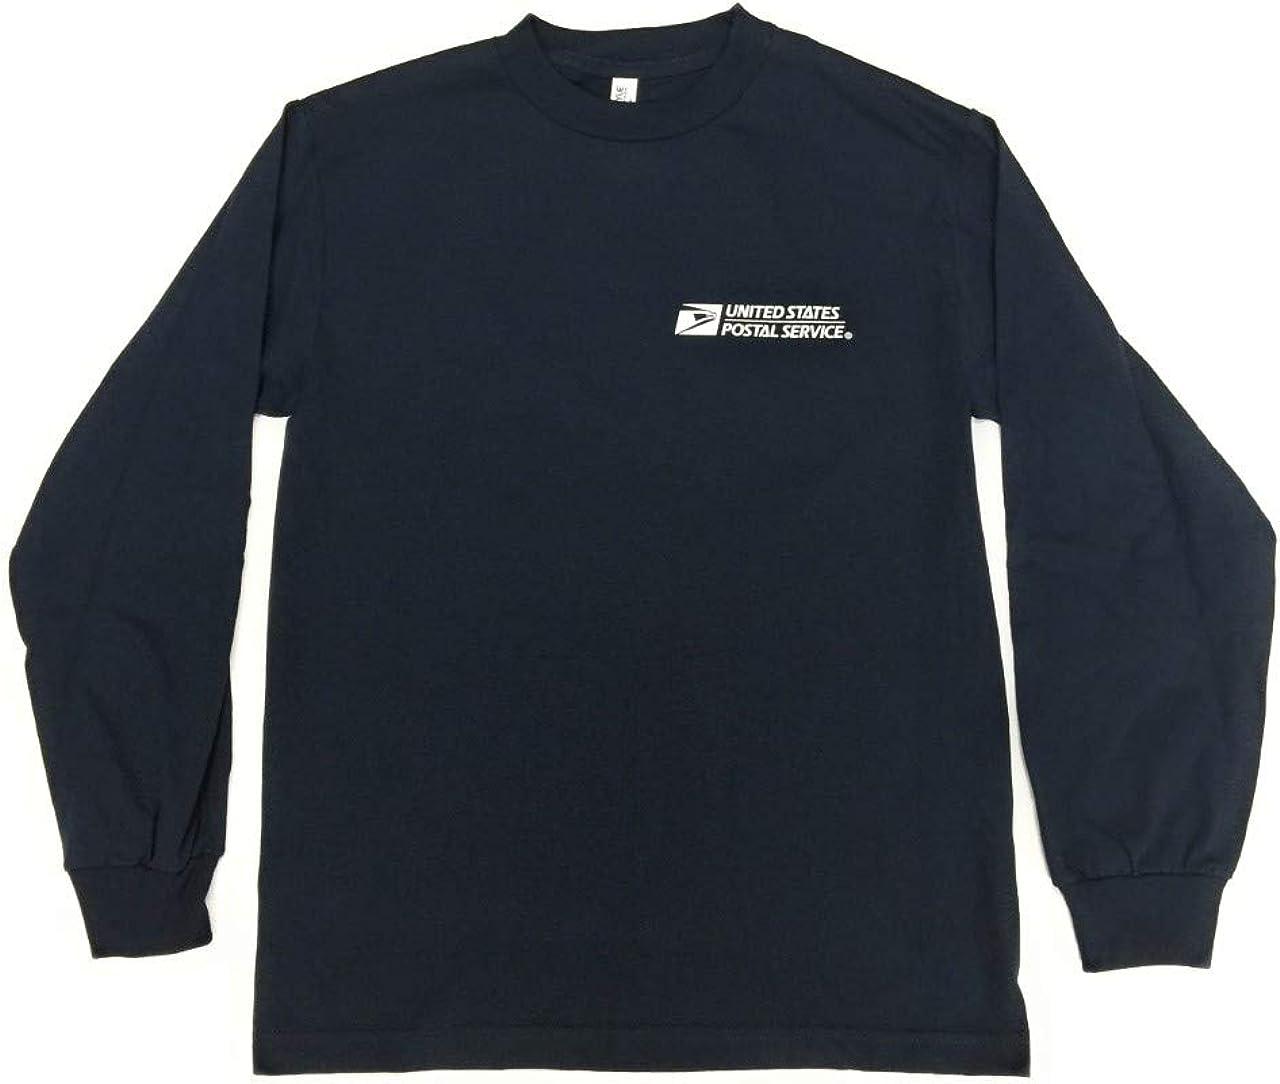 NASA BUZZ ALDRIN Astronaut space Shuttle moon USA MEN/'S New LONG SLEEVE T-Shirt